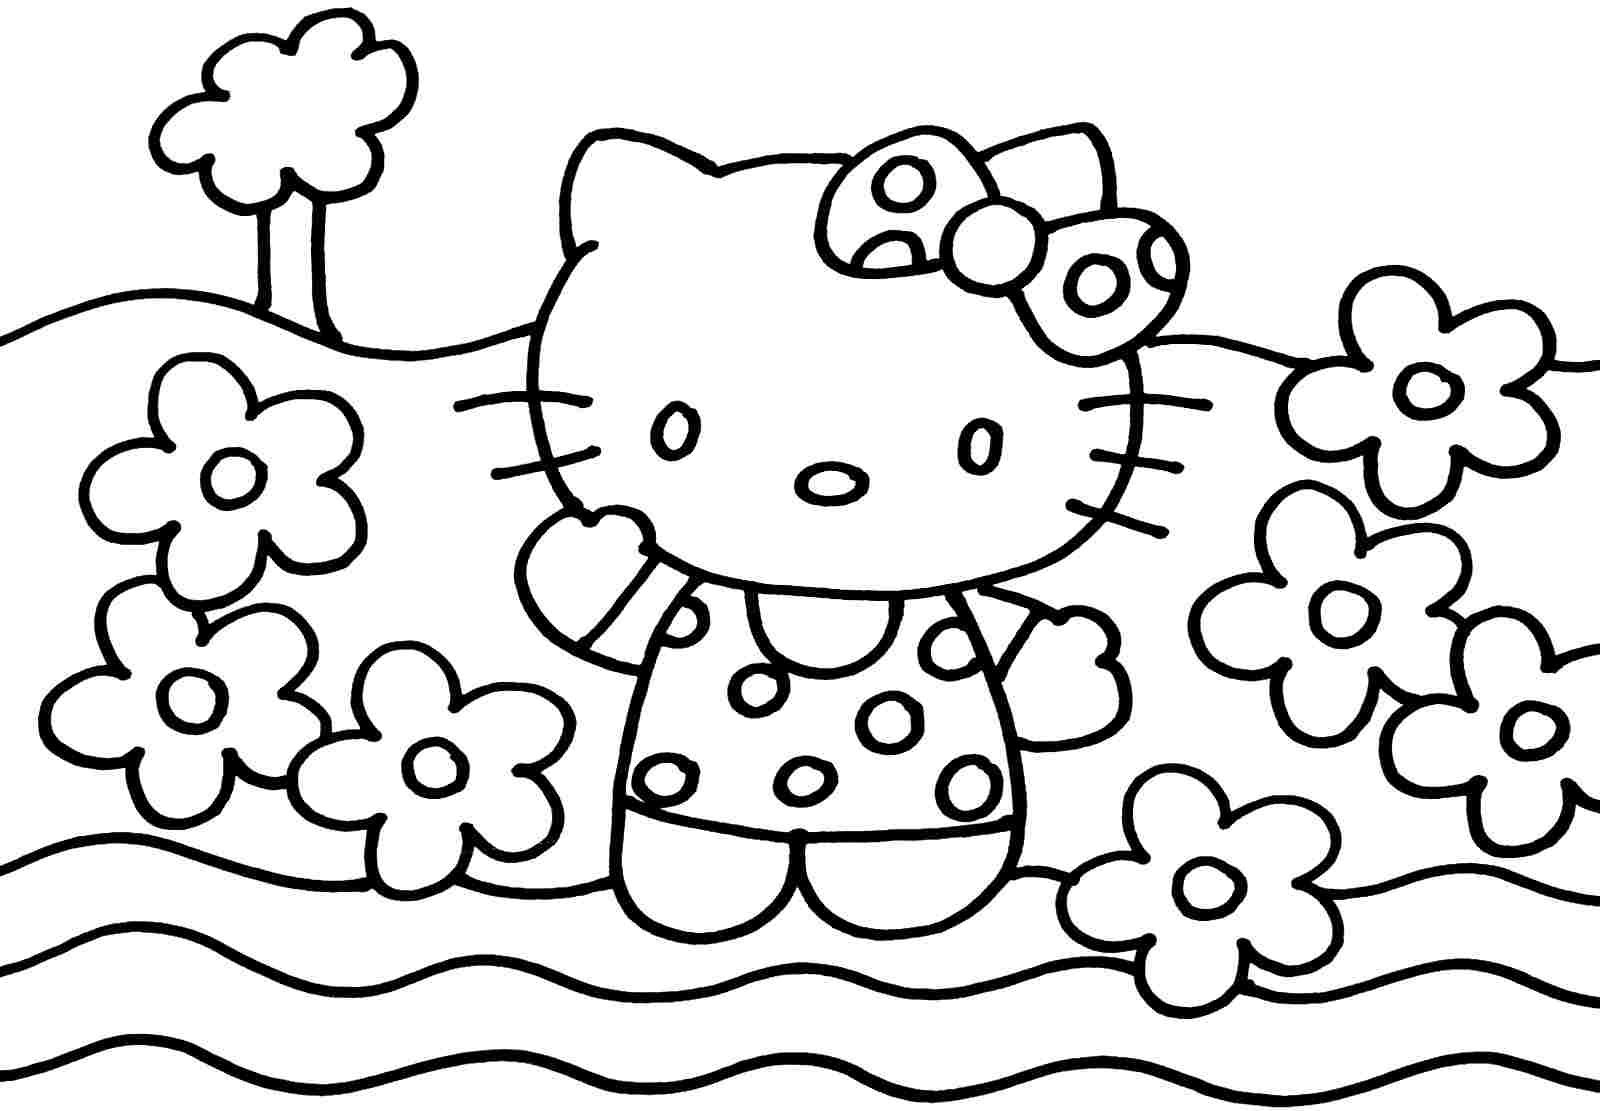 Printable Coloring Sheets Cartoon Hello Kitty For Boys Girls Id Hello Kitty Coloring Kitty Coloring Hello Kitty Colouring Pages